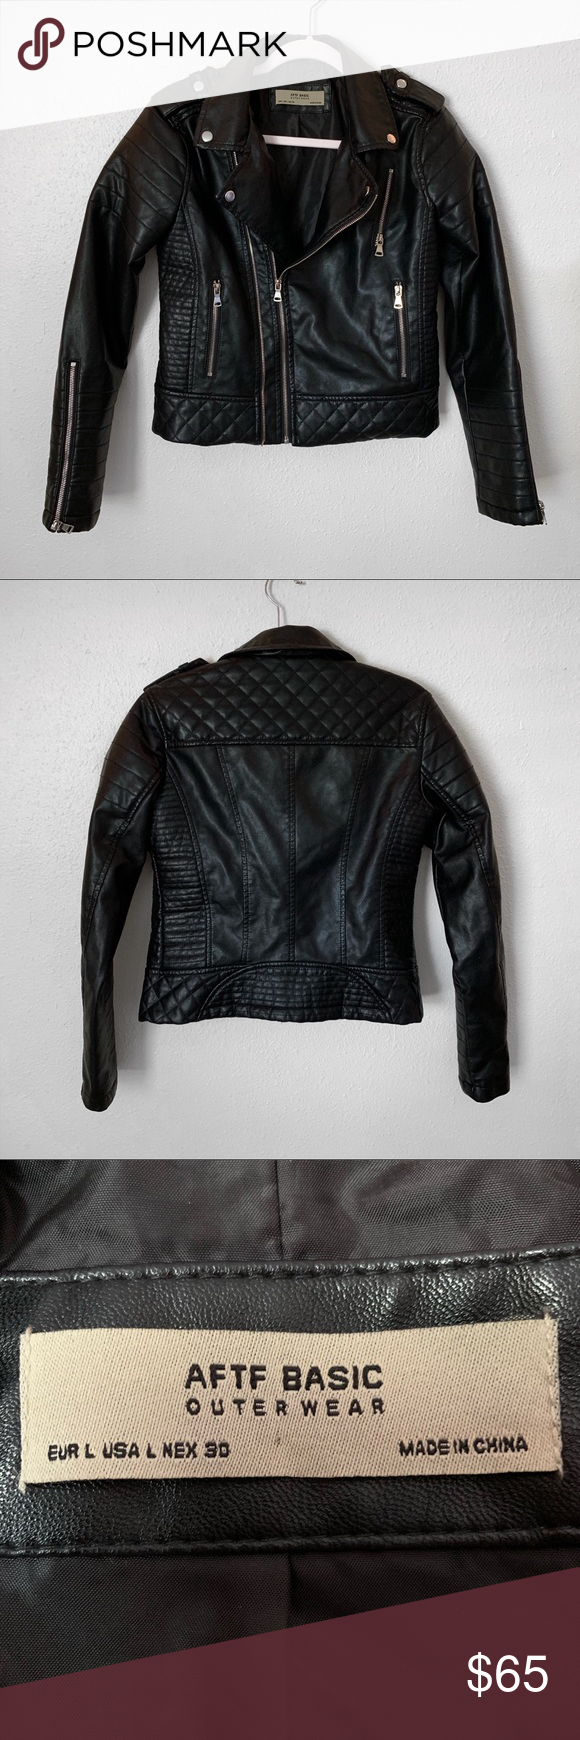 Aftf Basic Outerwear Faux Leather Moto Jacket Faux Leather Moto Jacket Leather Moto Jacket Leather Moto [ 1740 x 580 Pixel ]